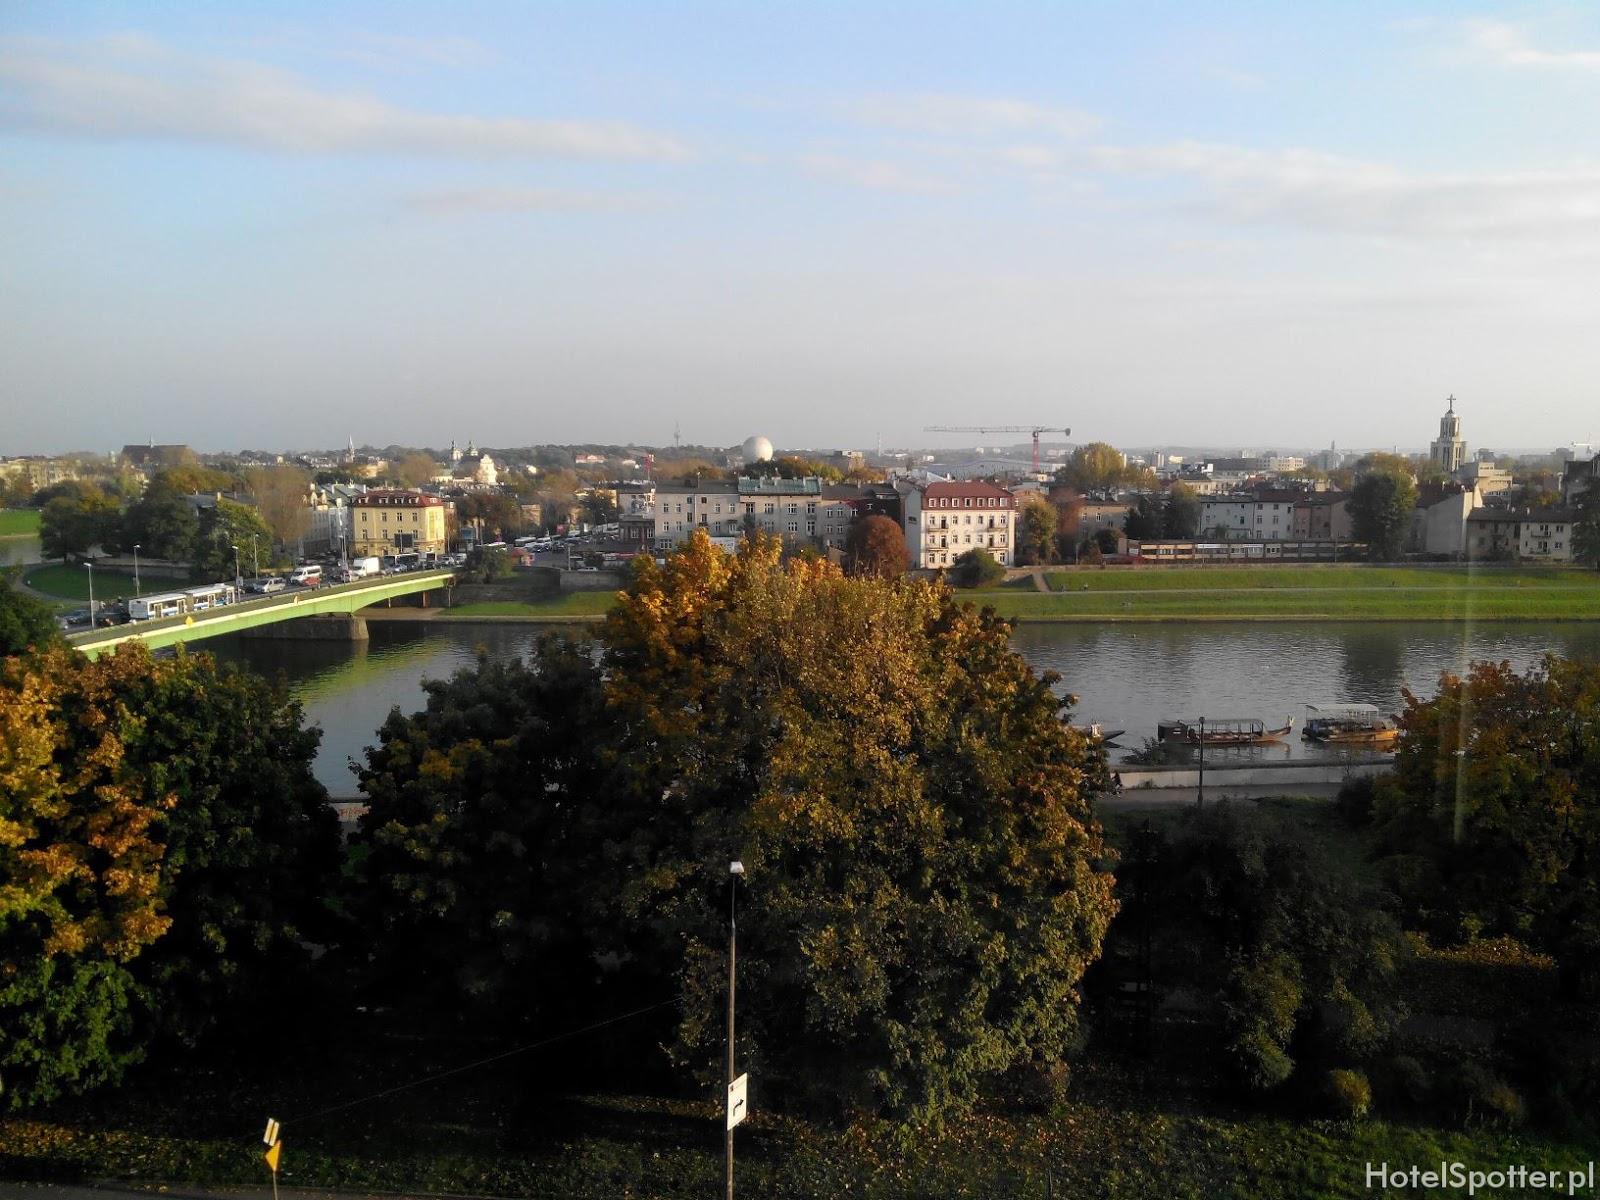 Novotel Krakow Centrum - widok z okna